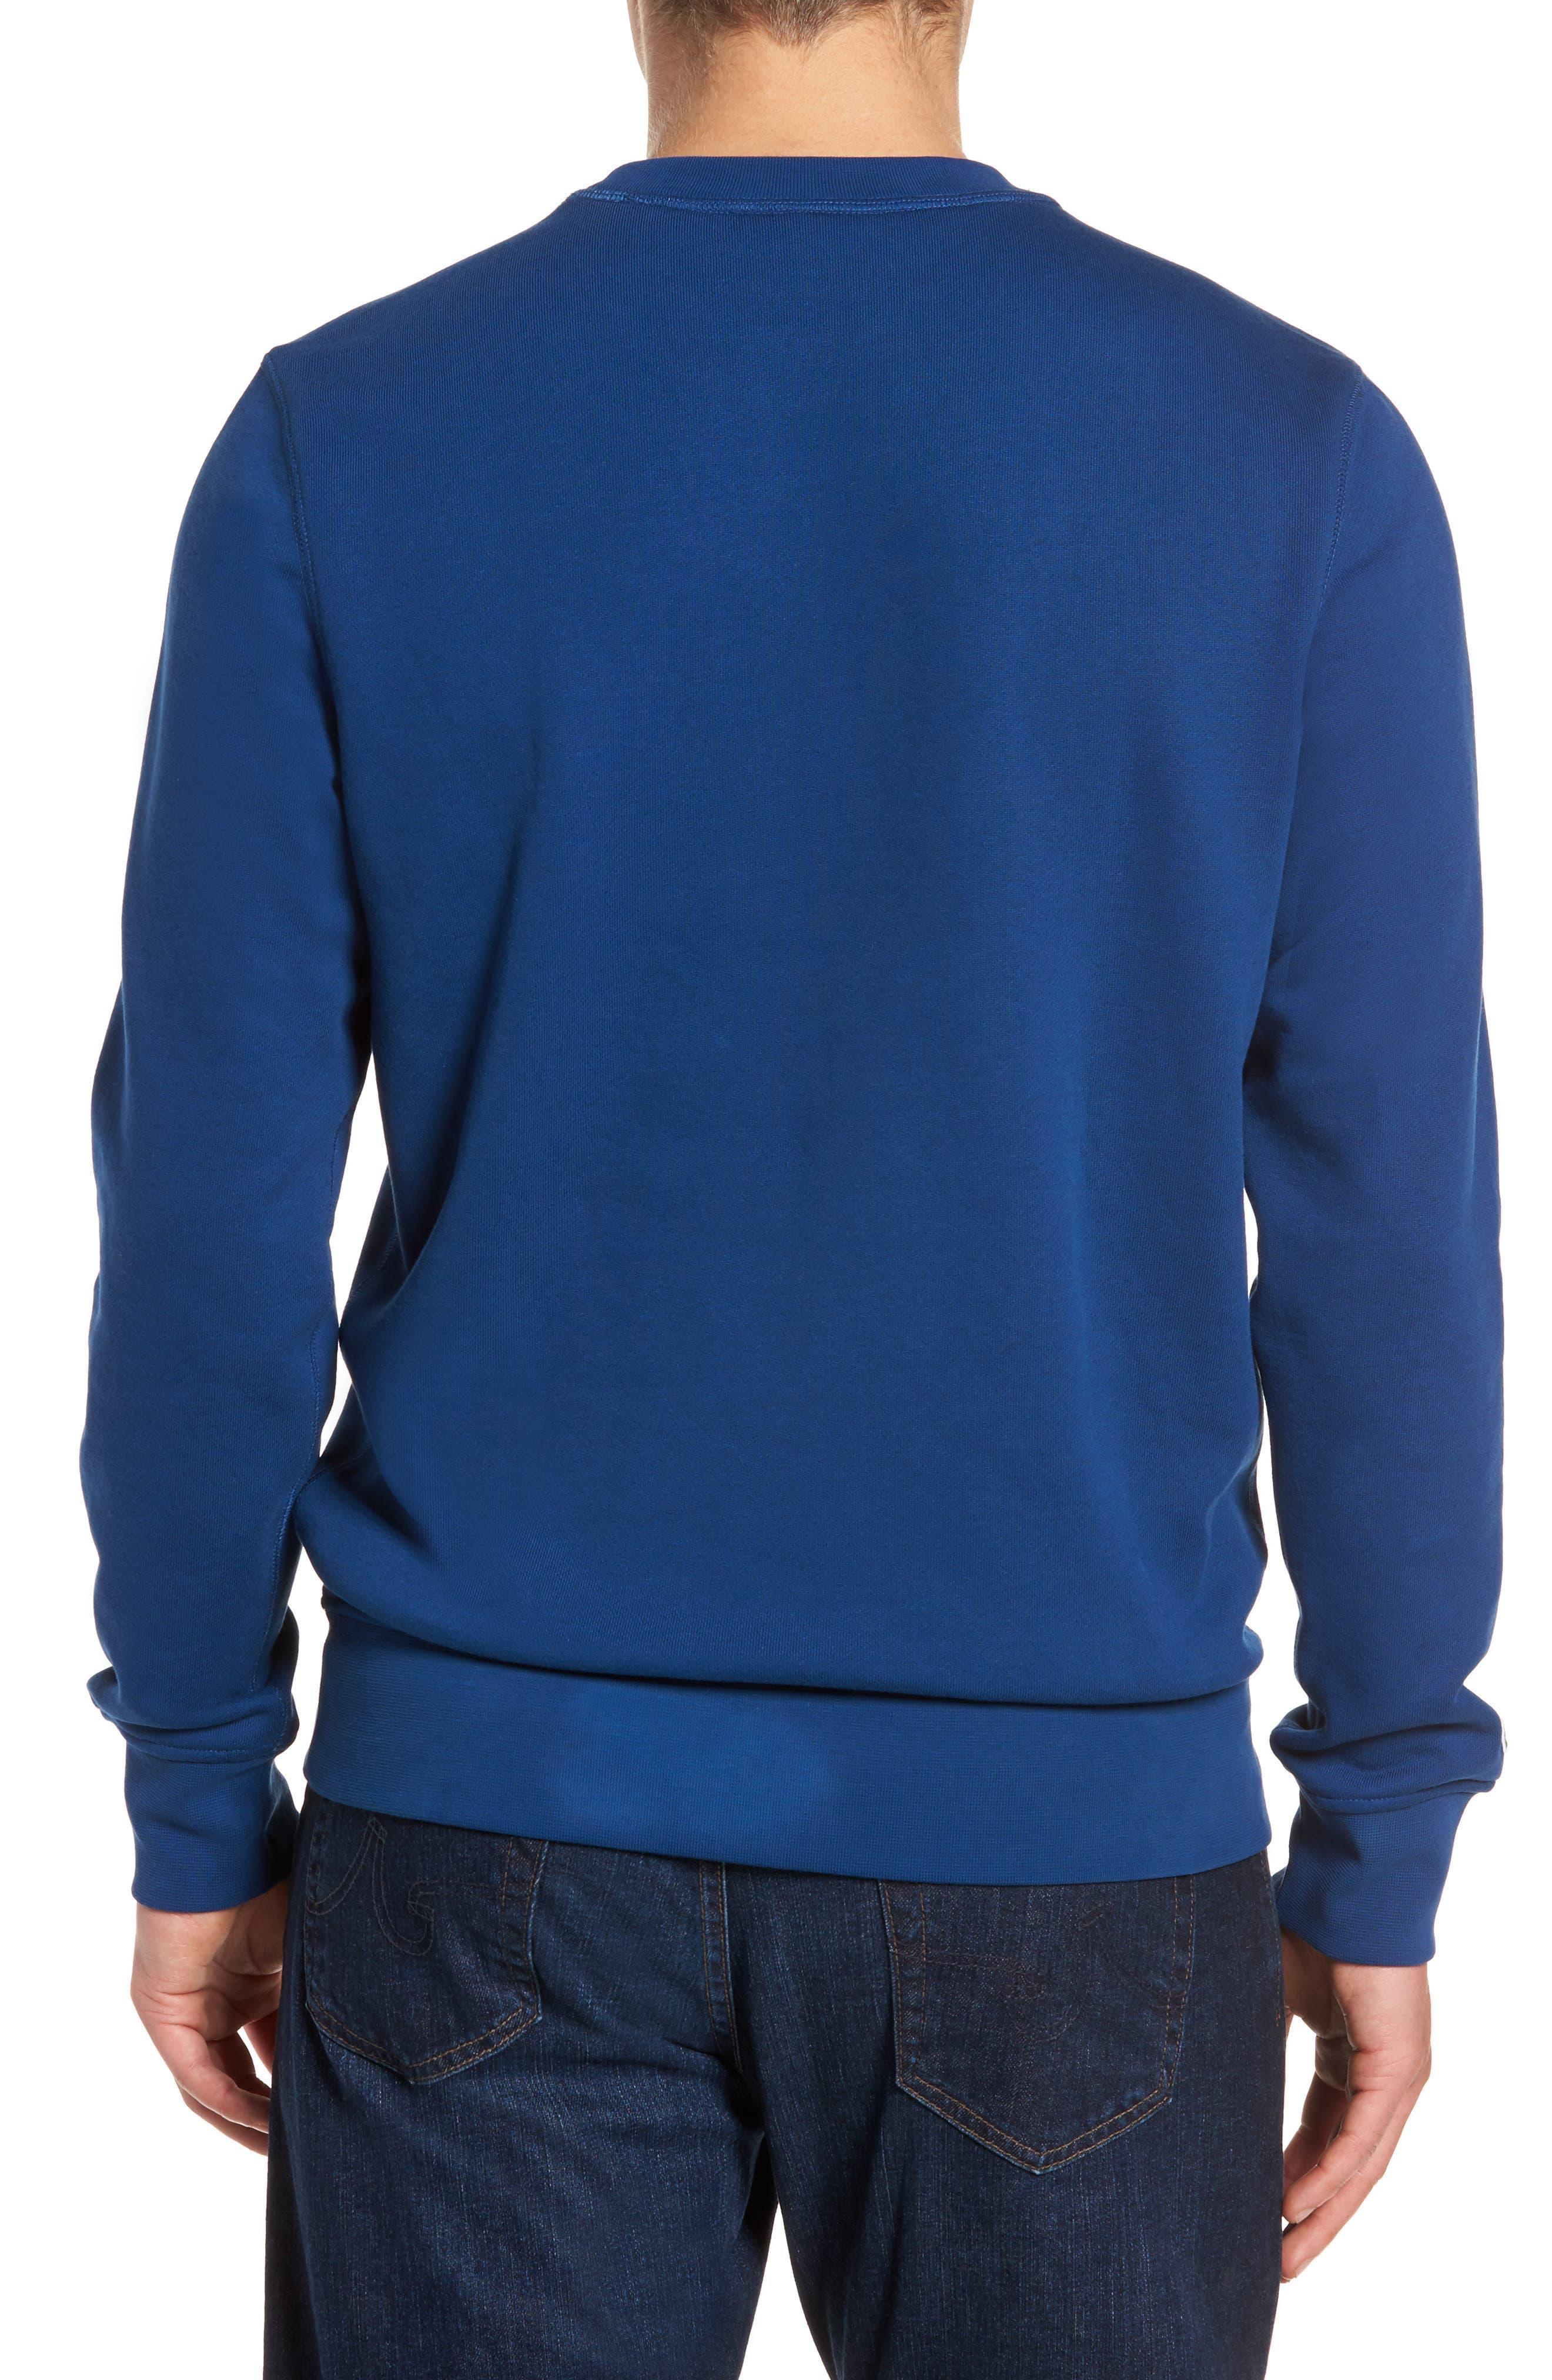 Lettering Fleece Sweatshirt,                             Alternate thumbnail 2, color,                             400